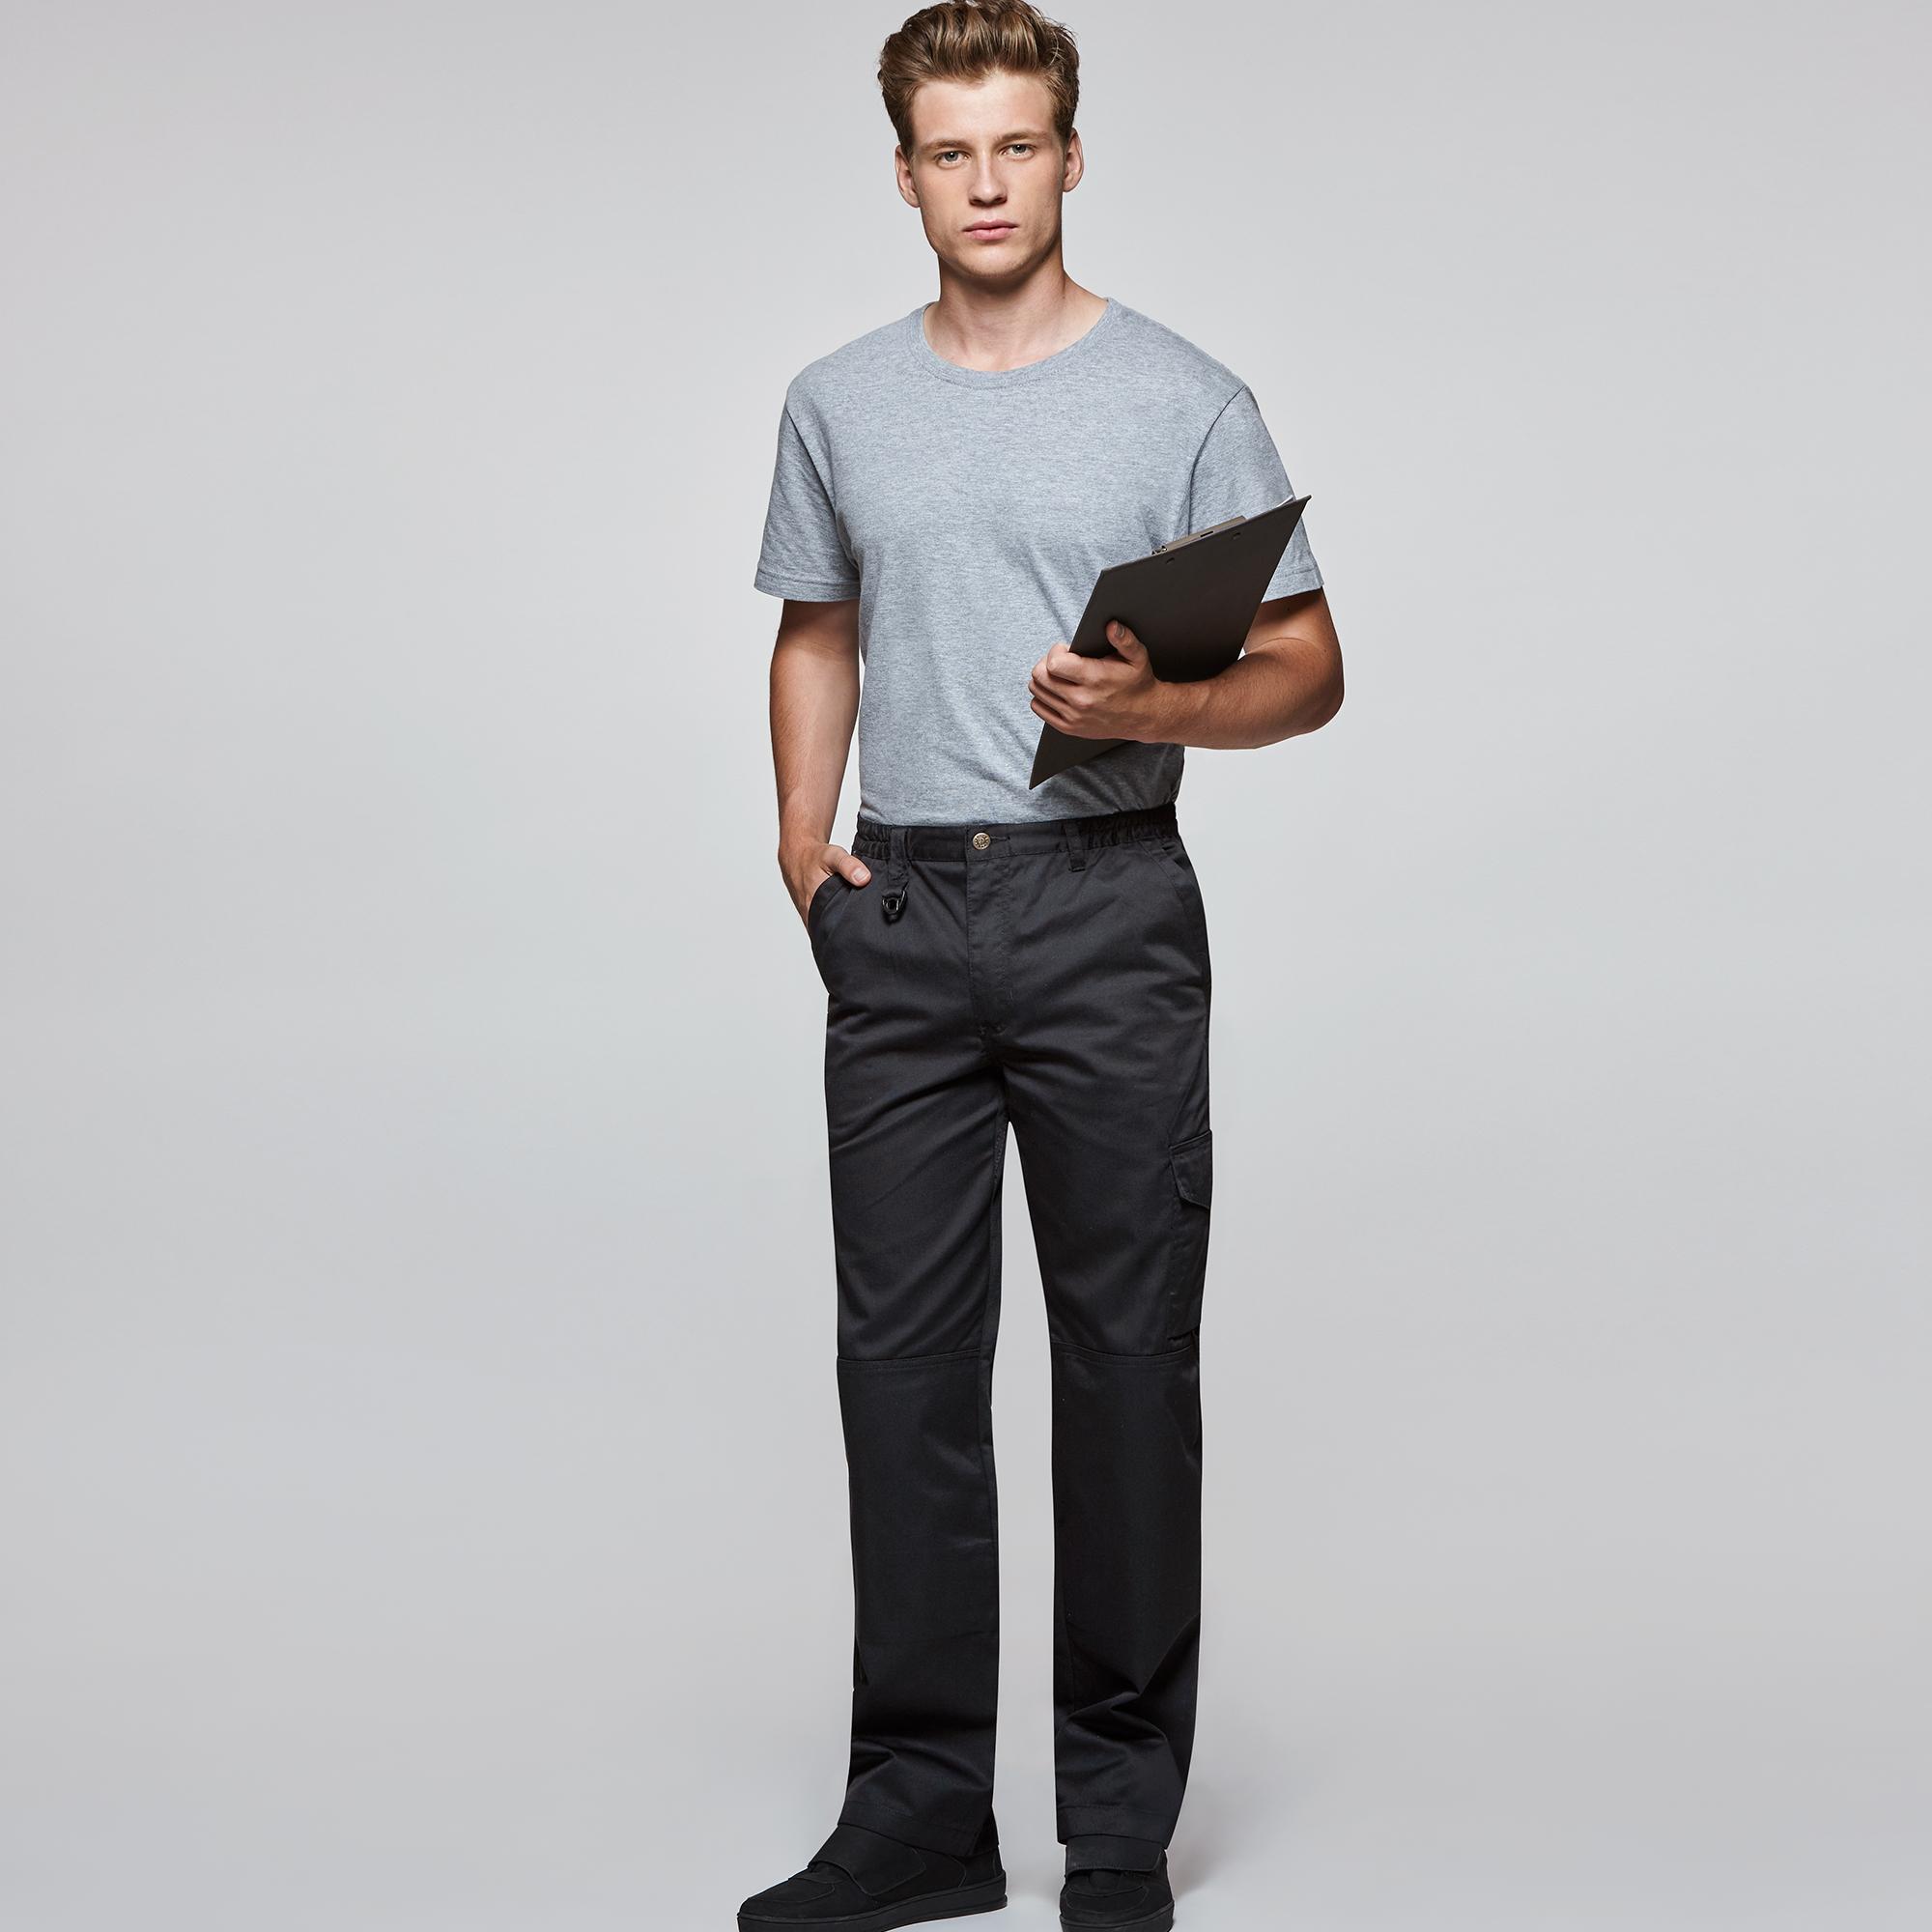 Pantalon ROLY protect